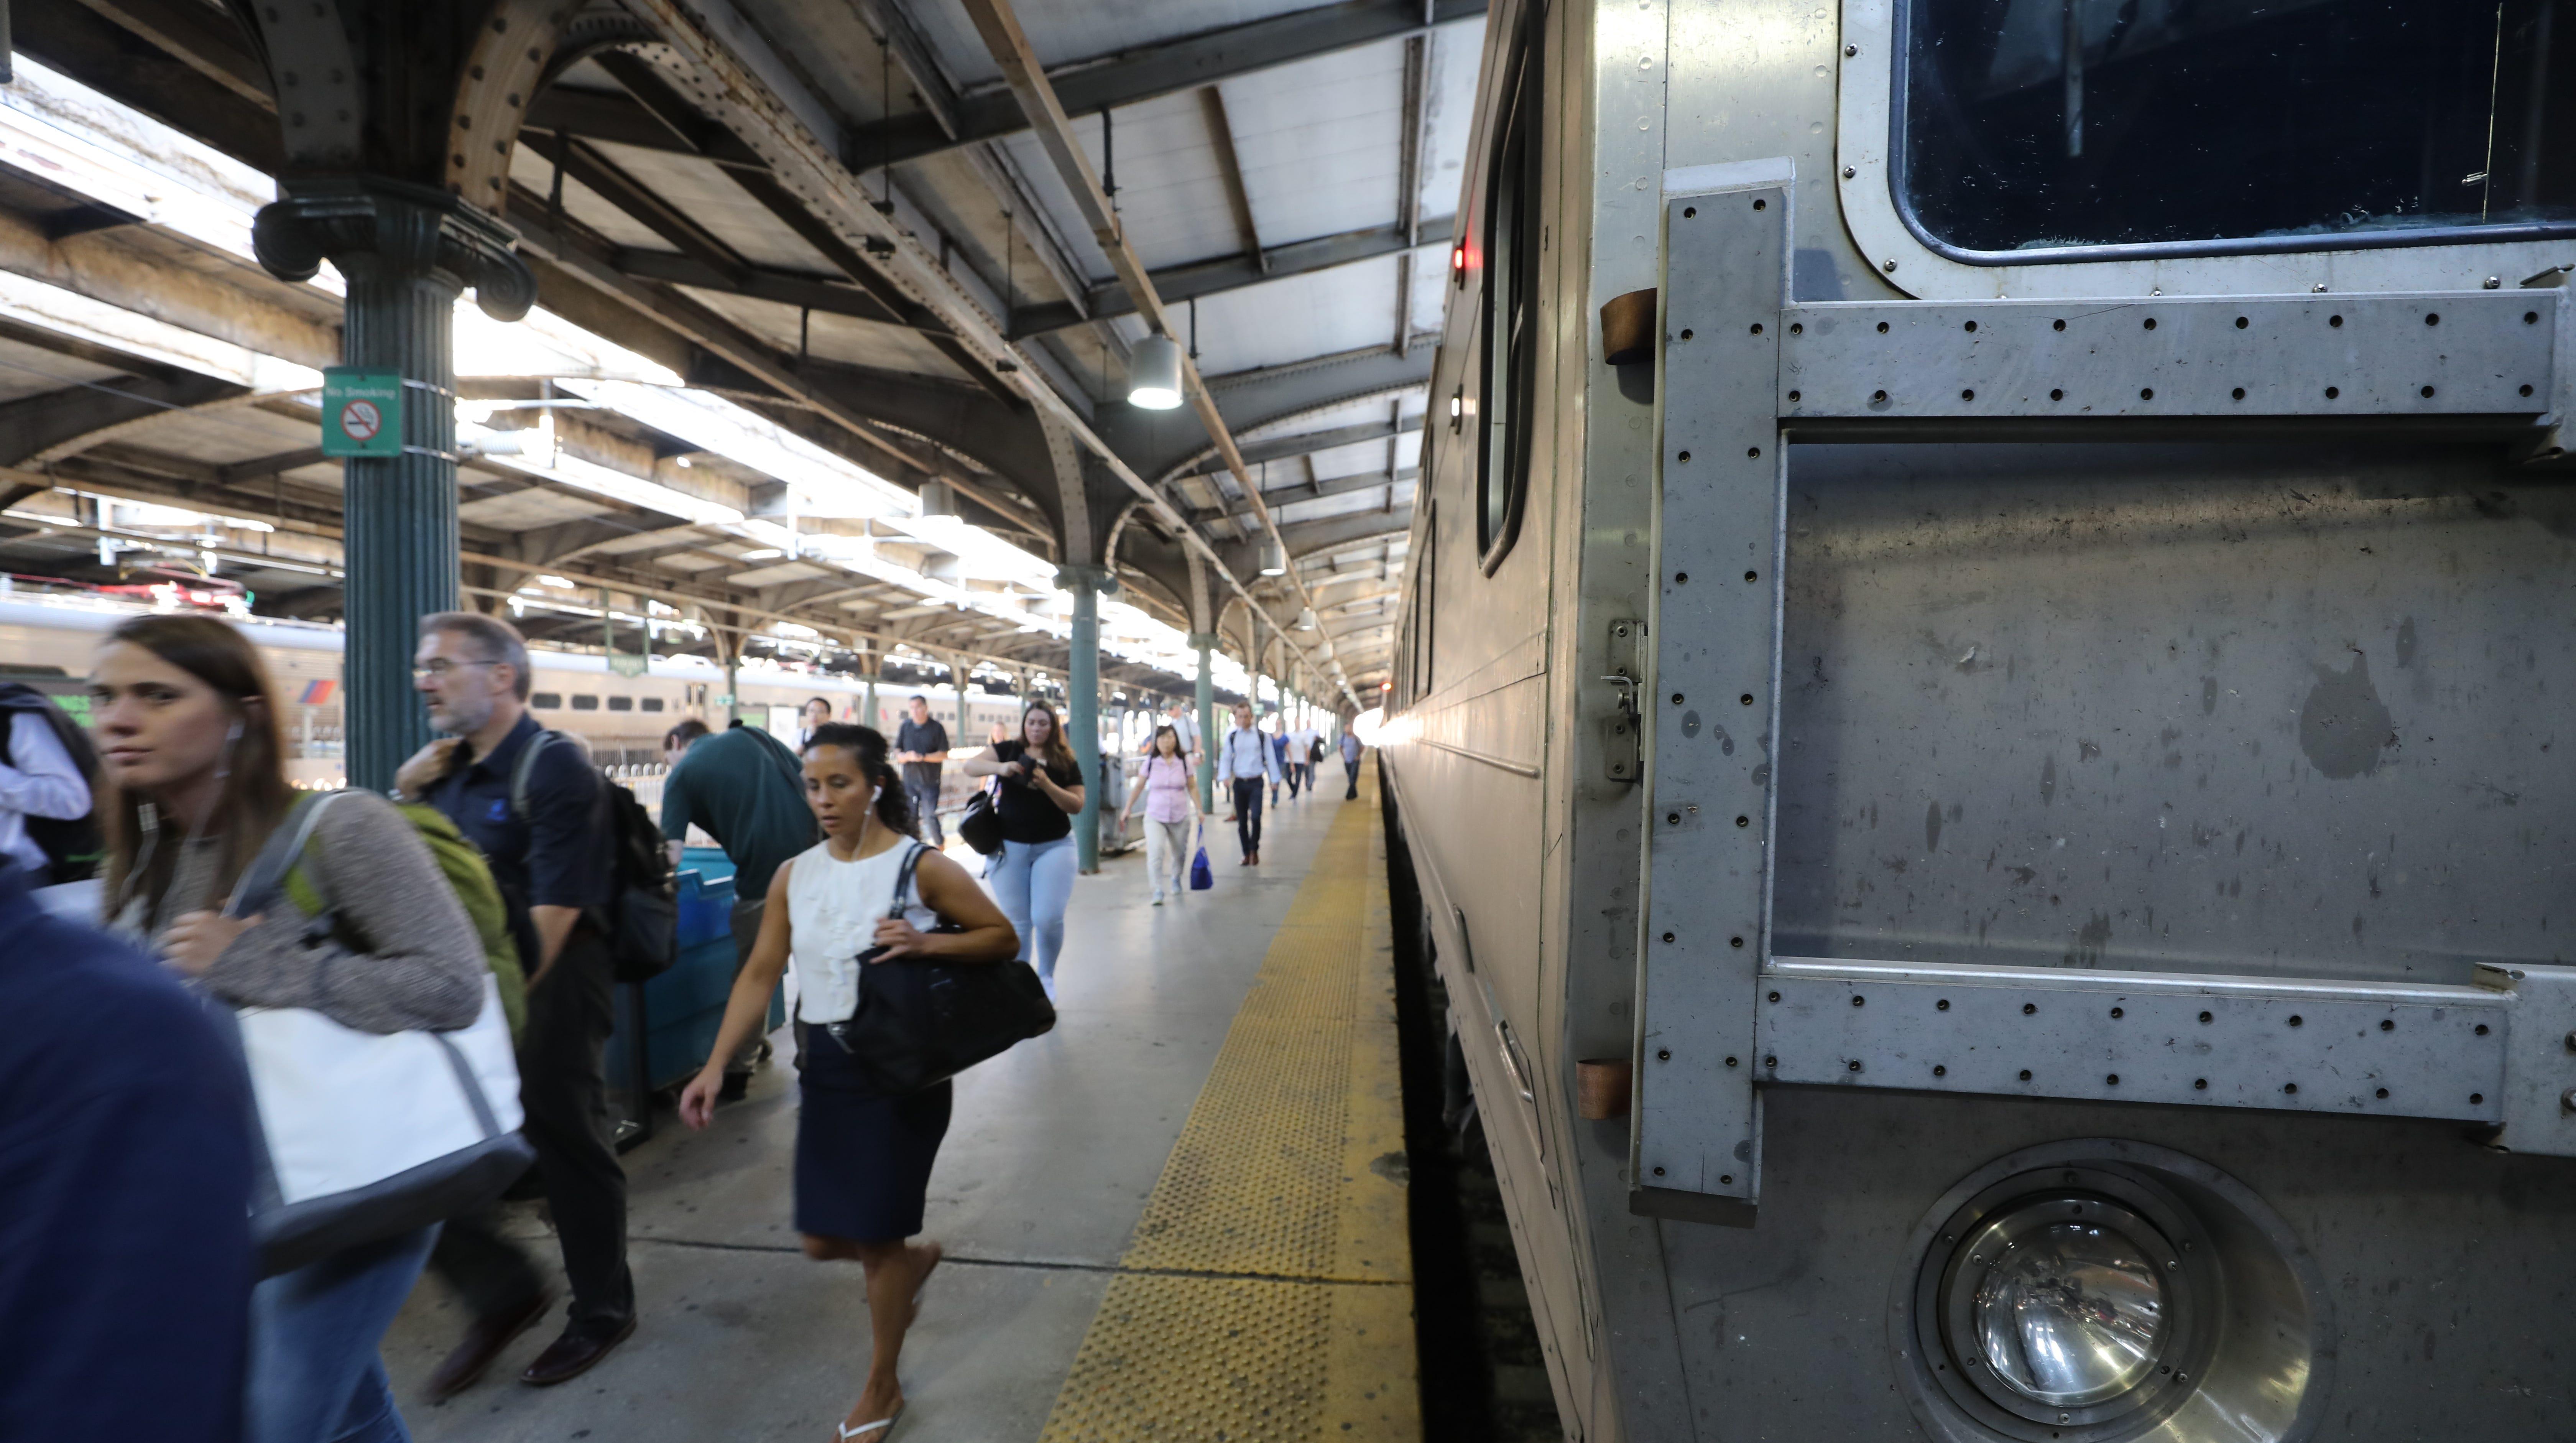 NJ Transit faces mounting lawsuits over 2016 Hoboken train crash